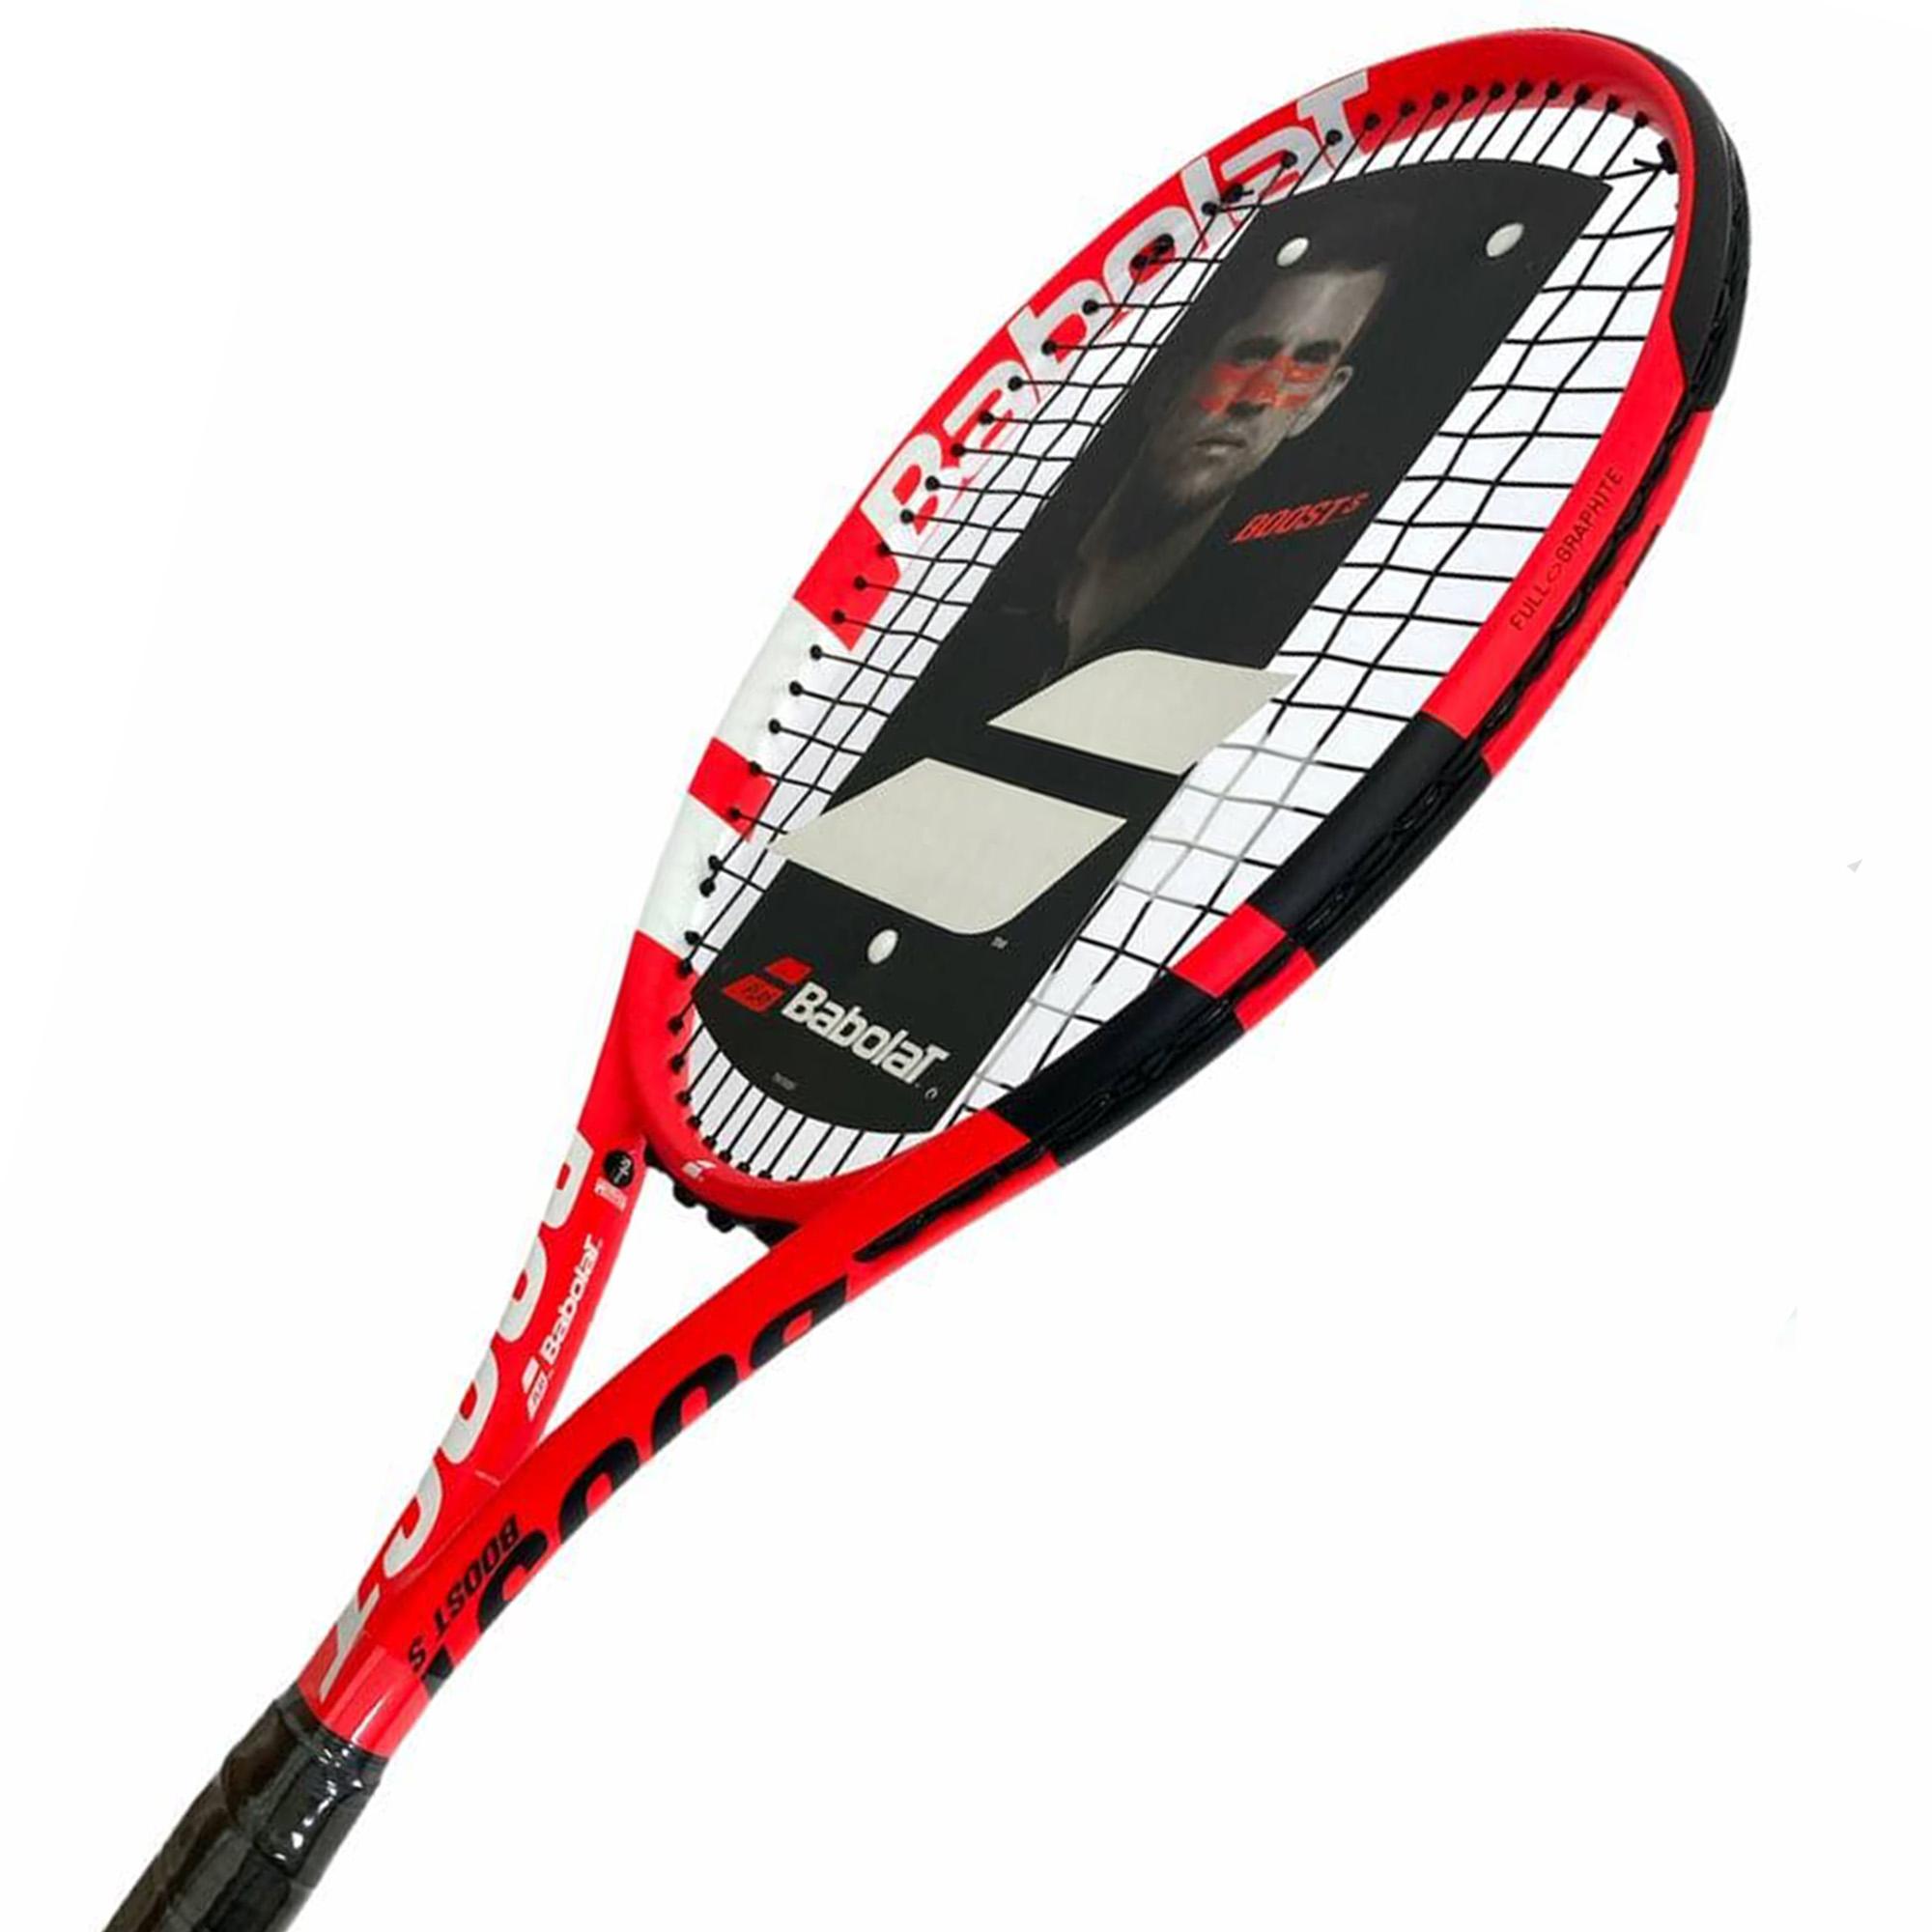 Raquete Babolat Boost S - Original New